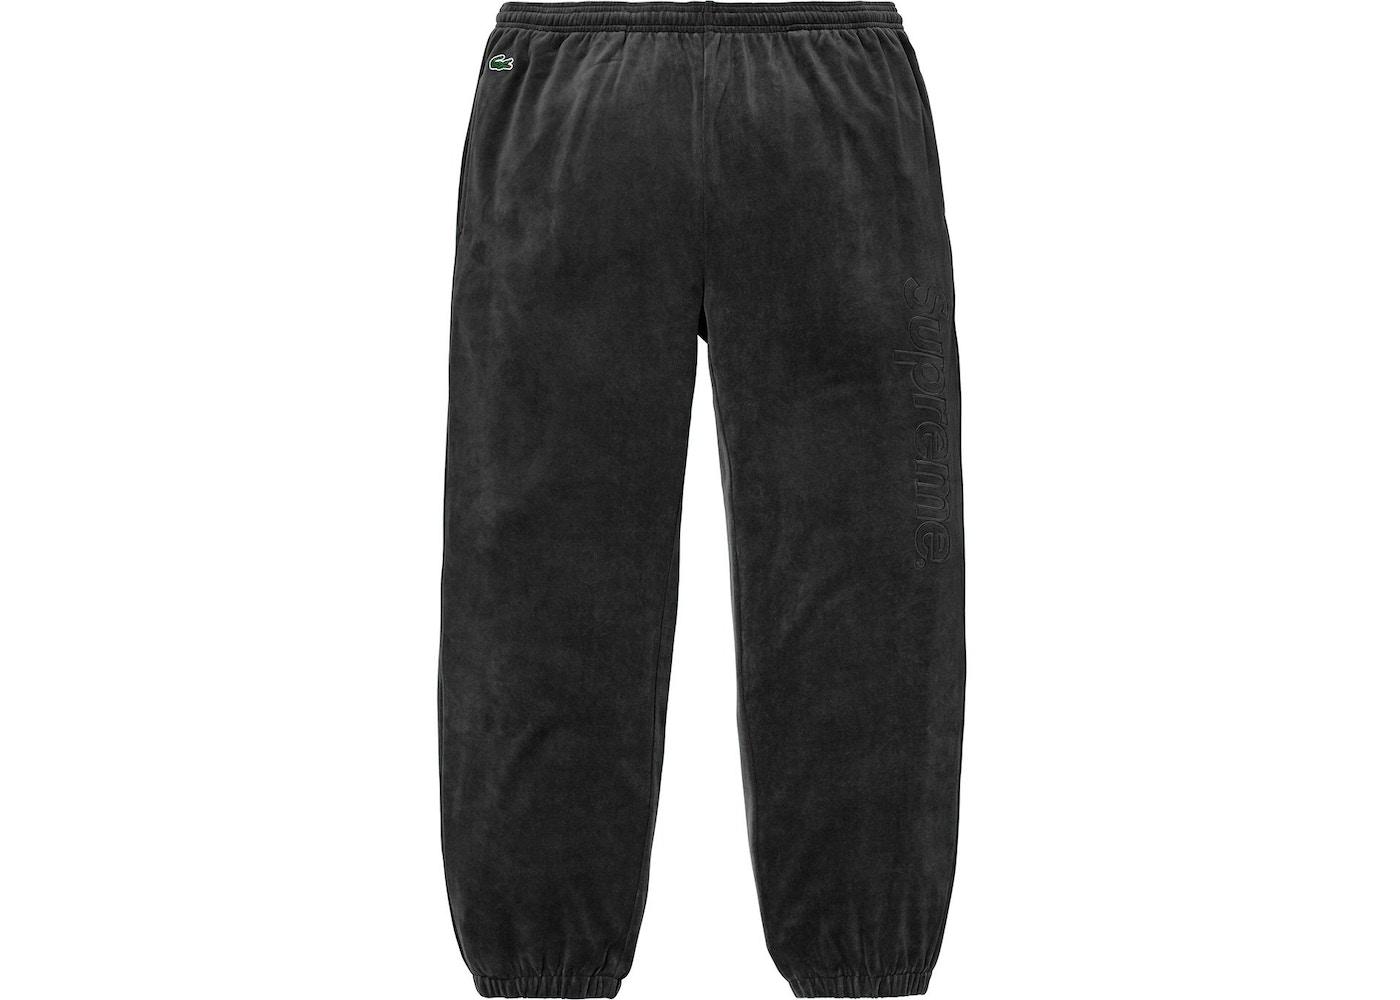 78760a726271 Supreme LACOSTE Velour Track Pant Black - SS18